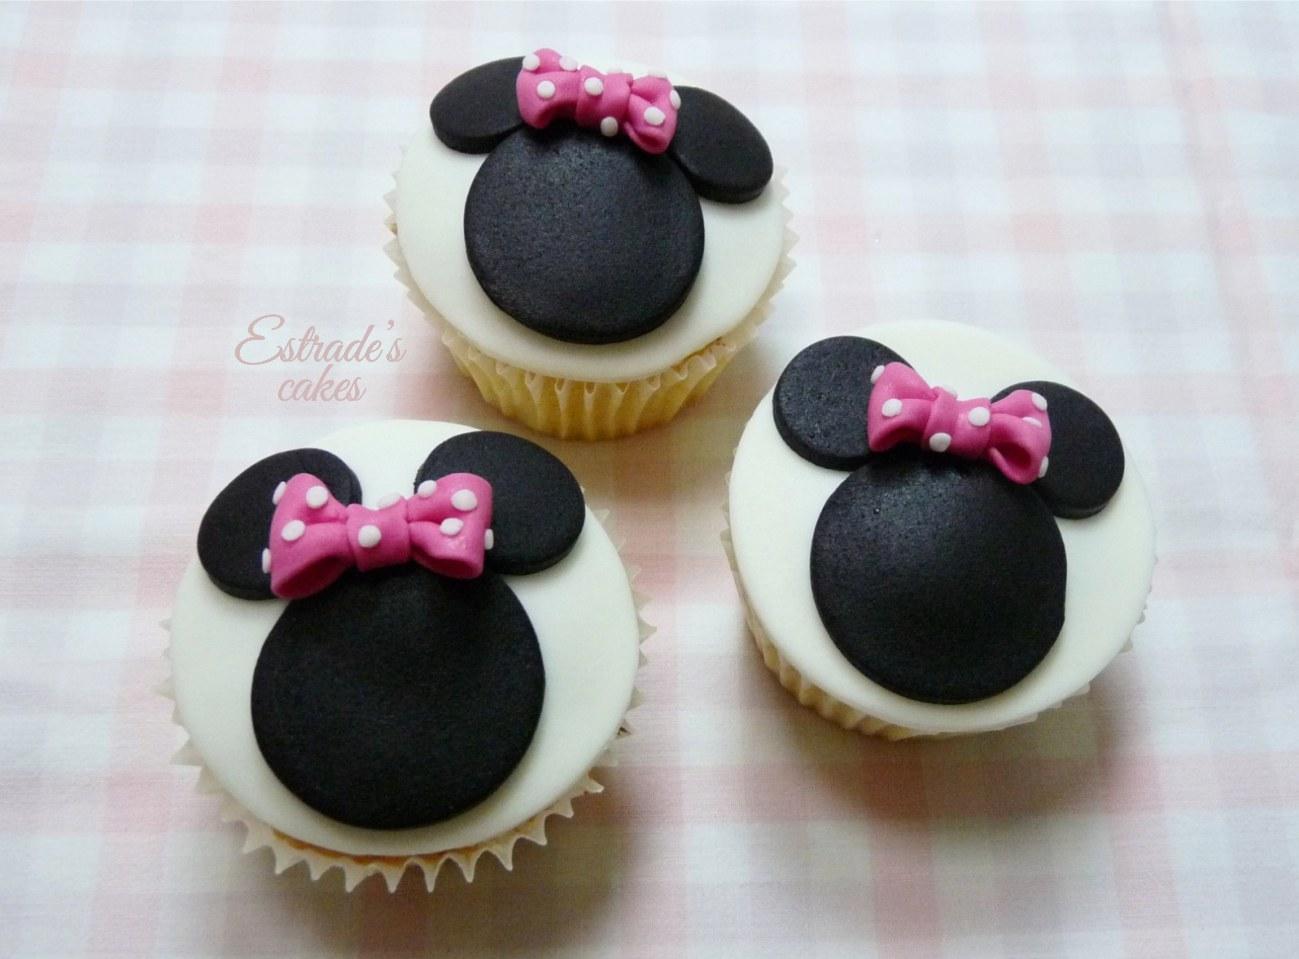 Estrades Cakes Cupcakes De Minie Mouse